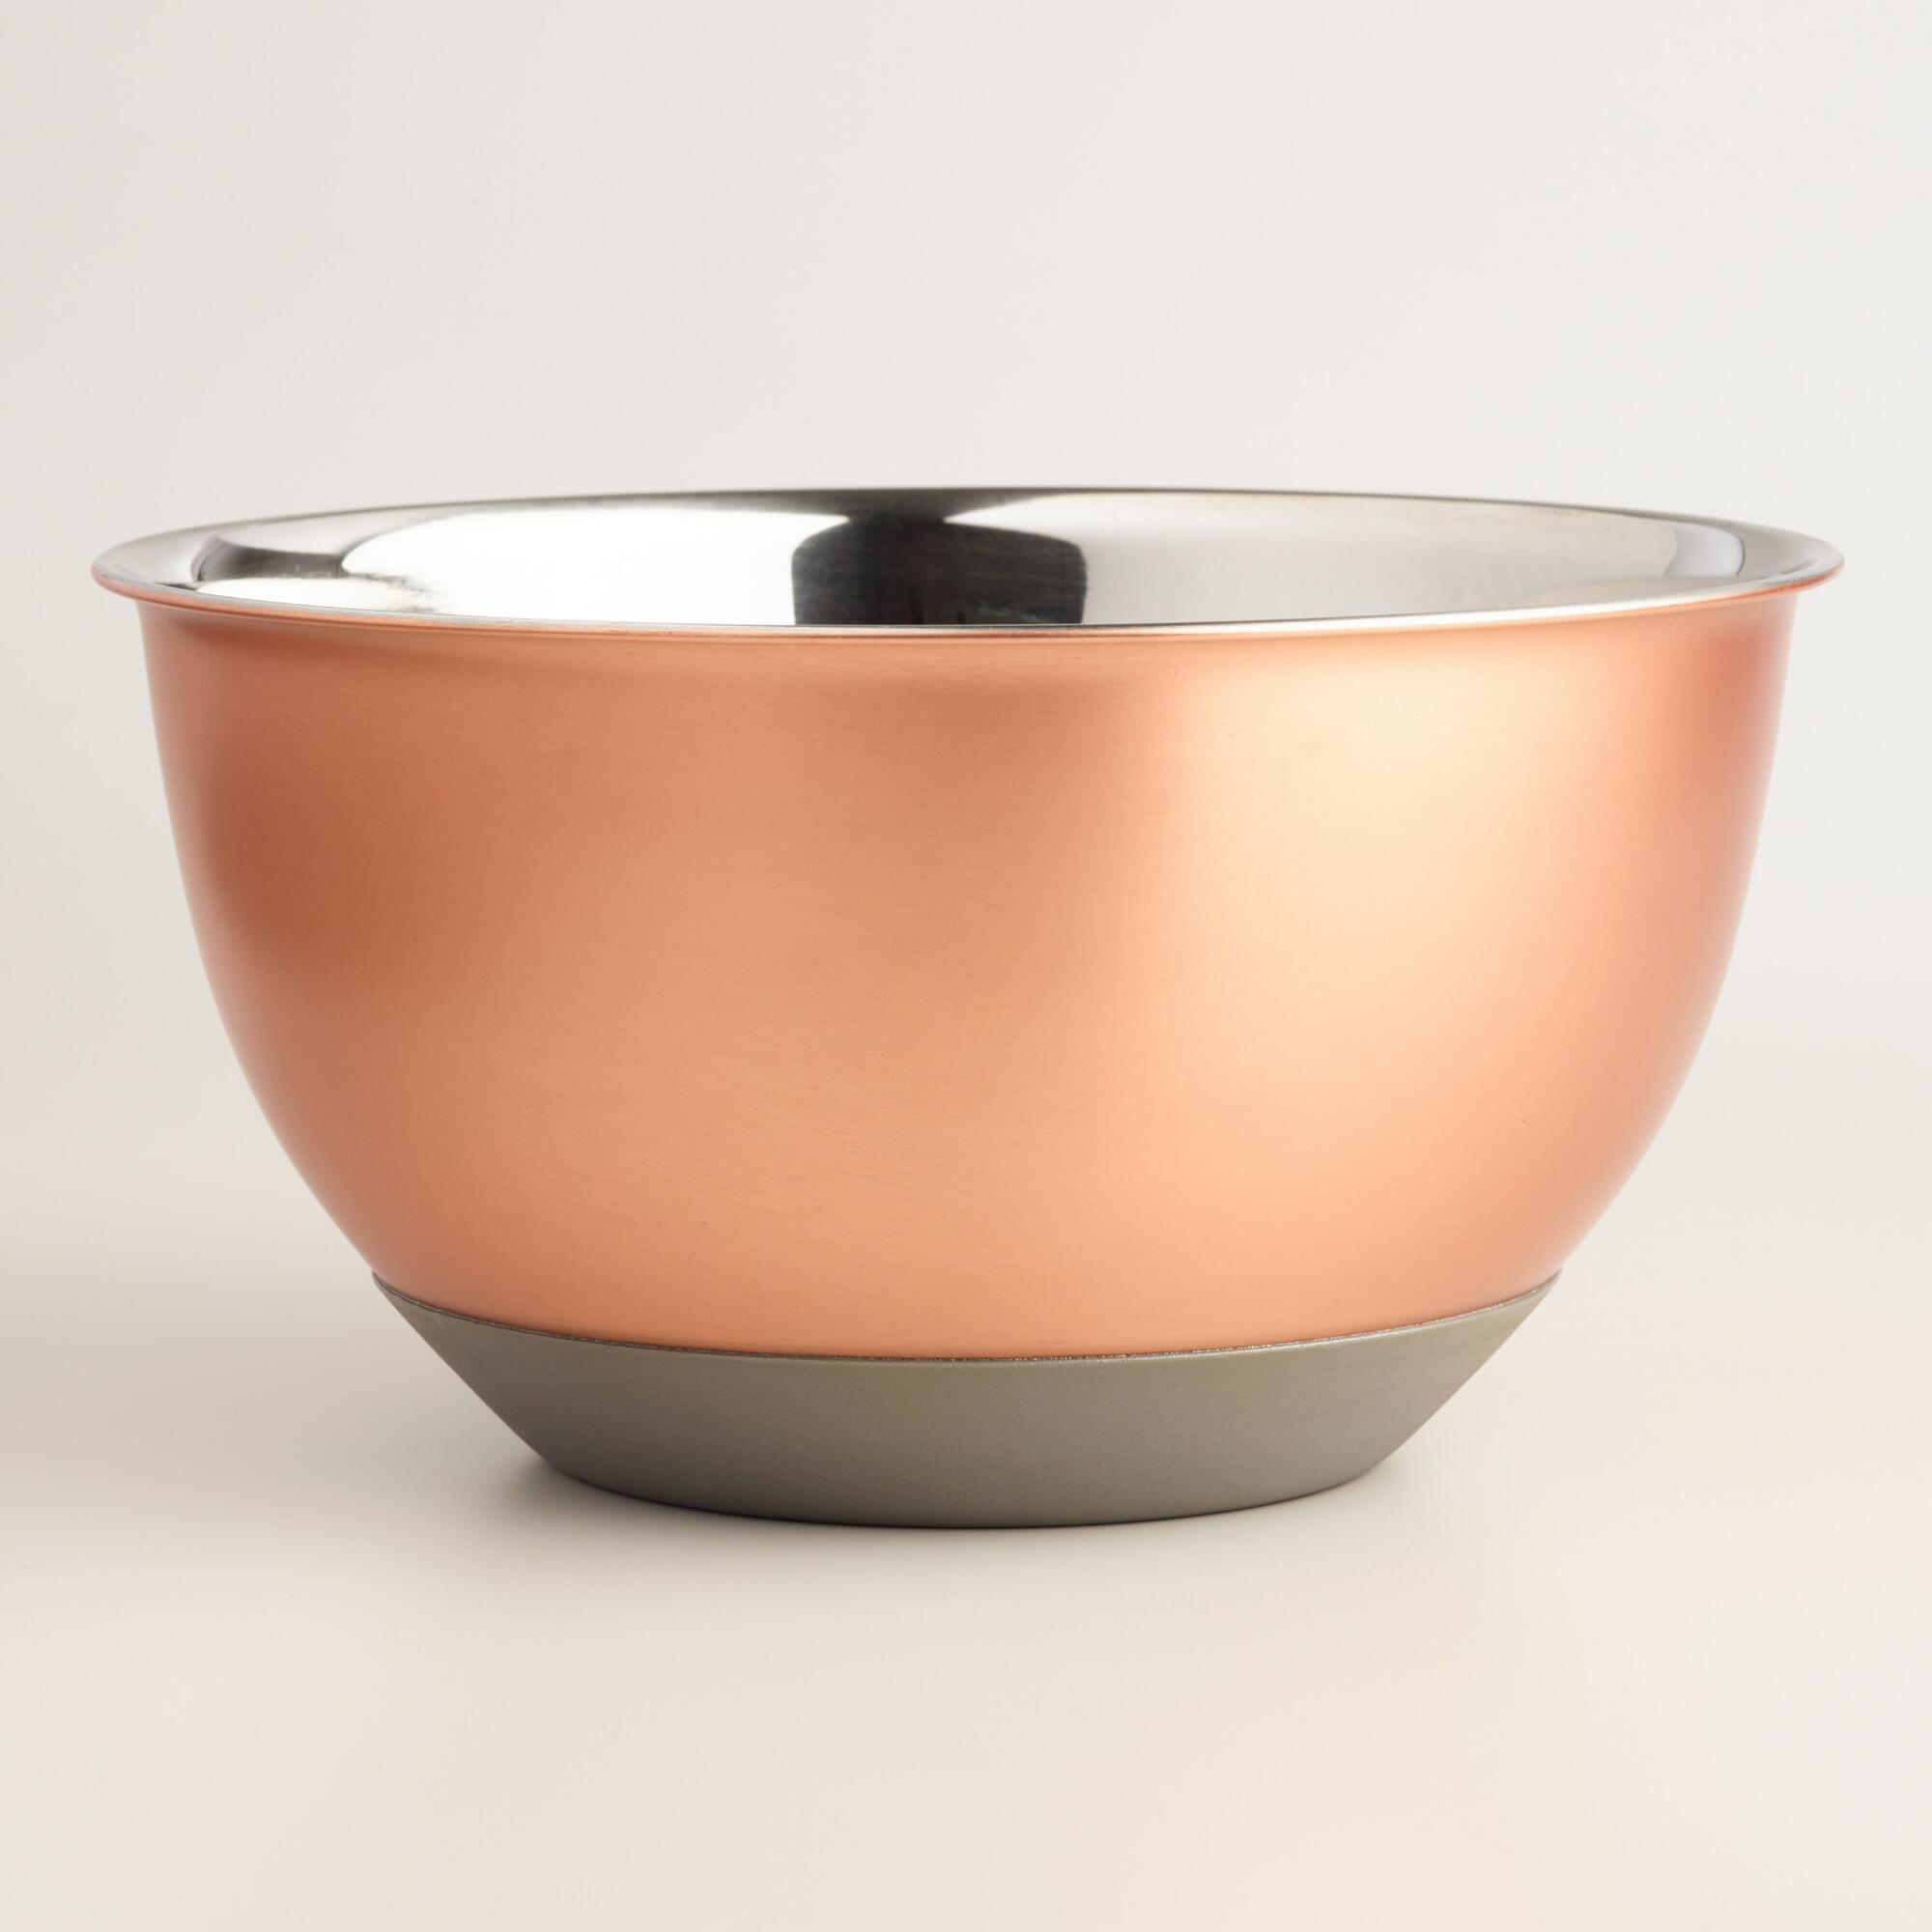 6 Quart Copper Nonskid Mixing Bowl   World Market